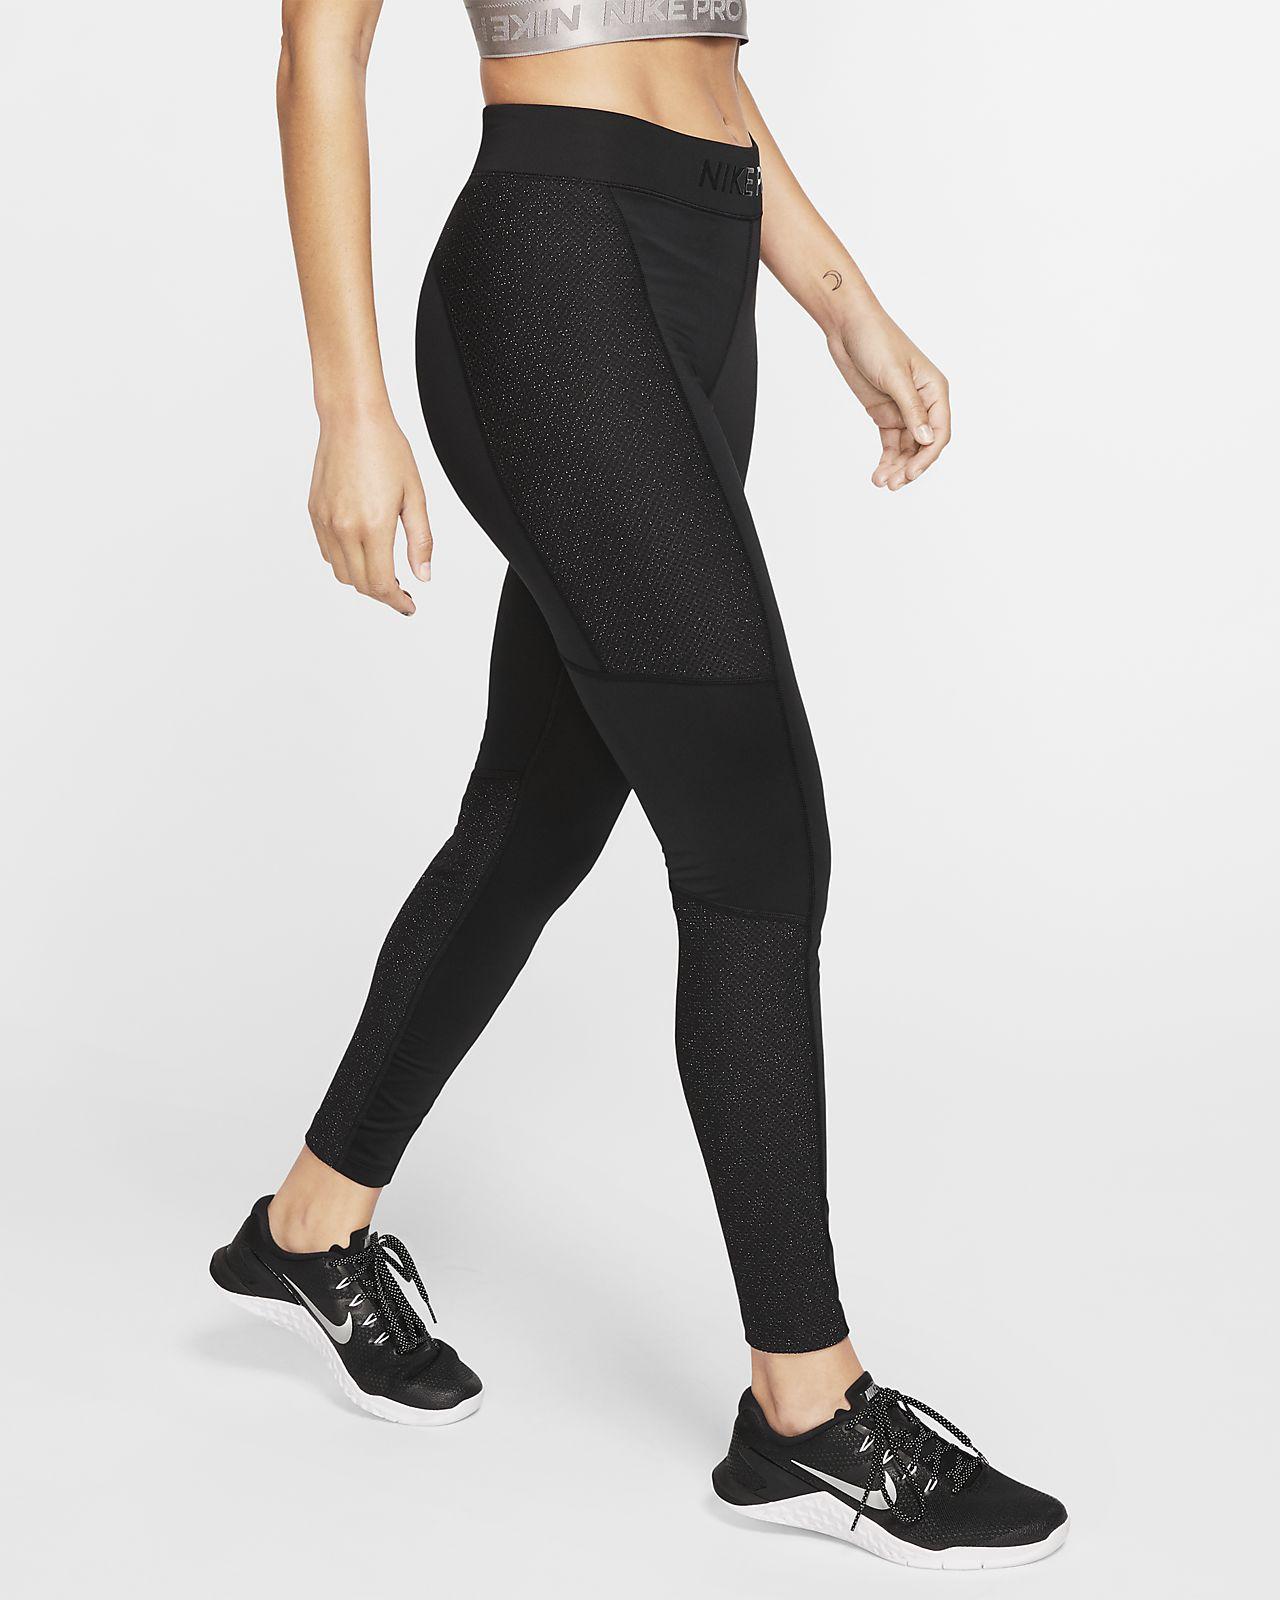 Nike Pro Women Training Tights Black | Racketspesialisten.no